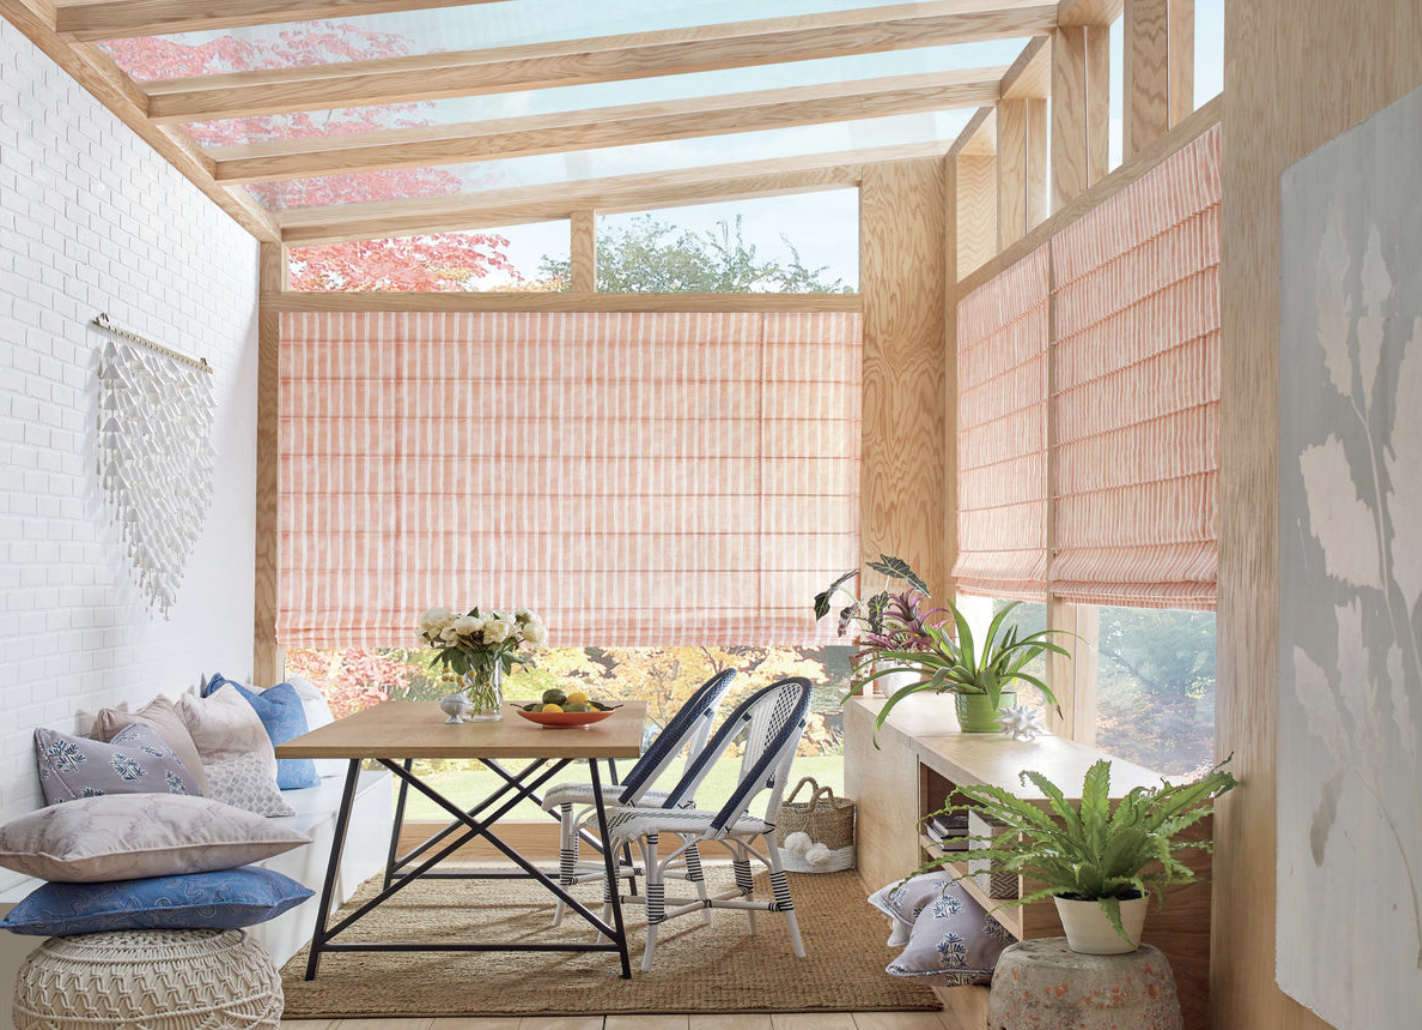 Design Studio Roman Shades for Patios and Sunroom Light Control in Homes Near Tustin, California (CA)